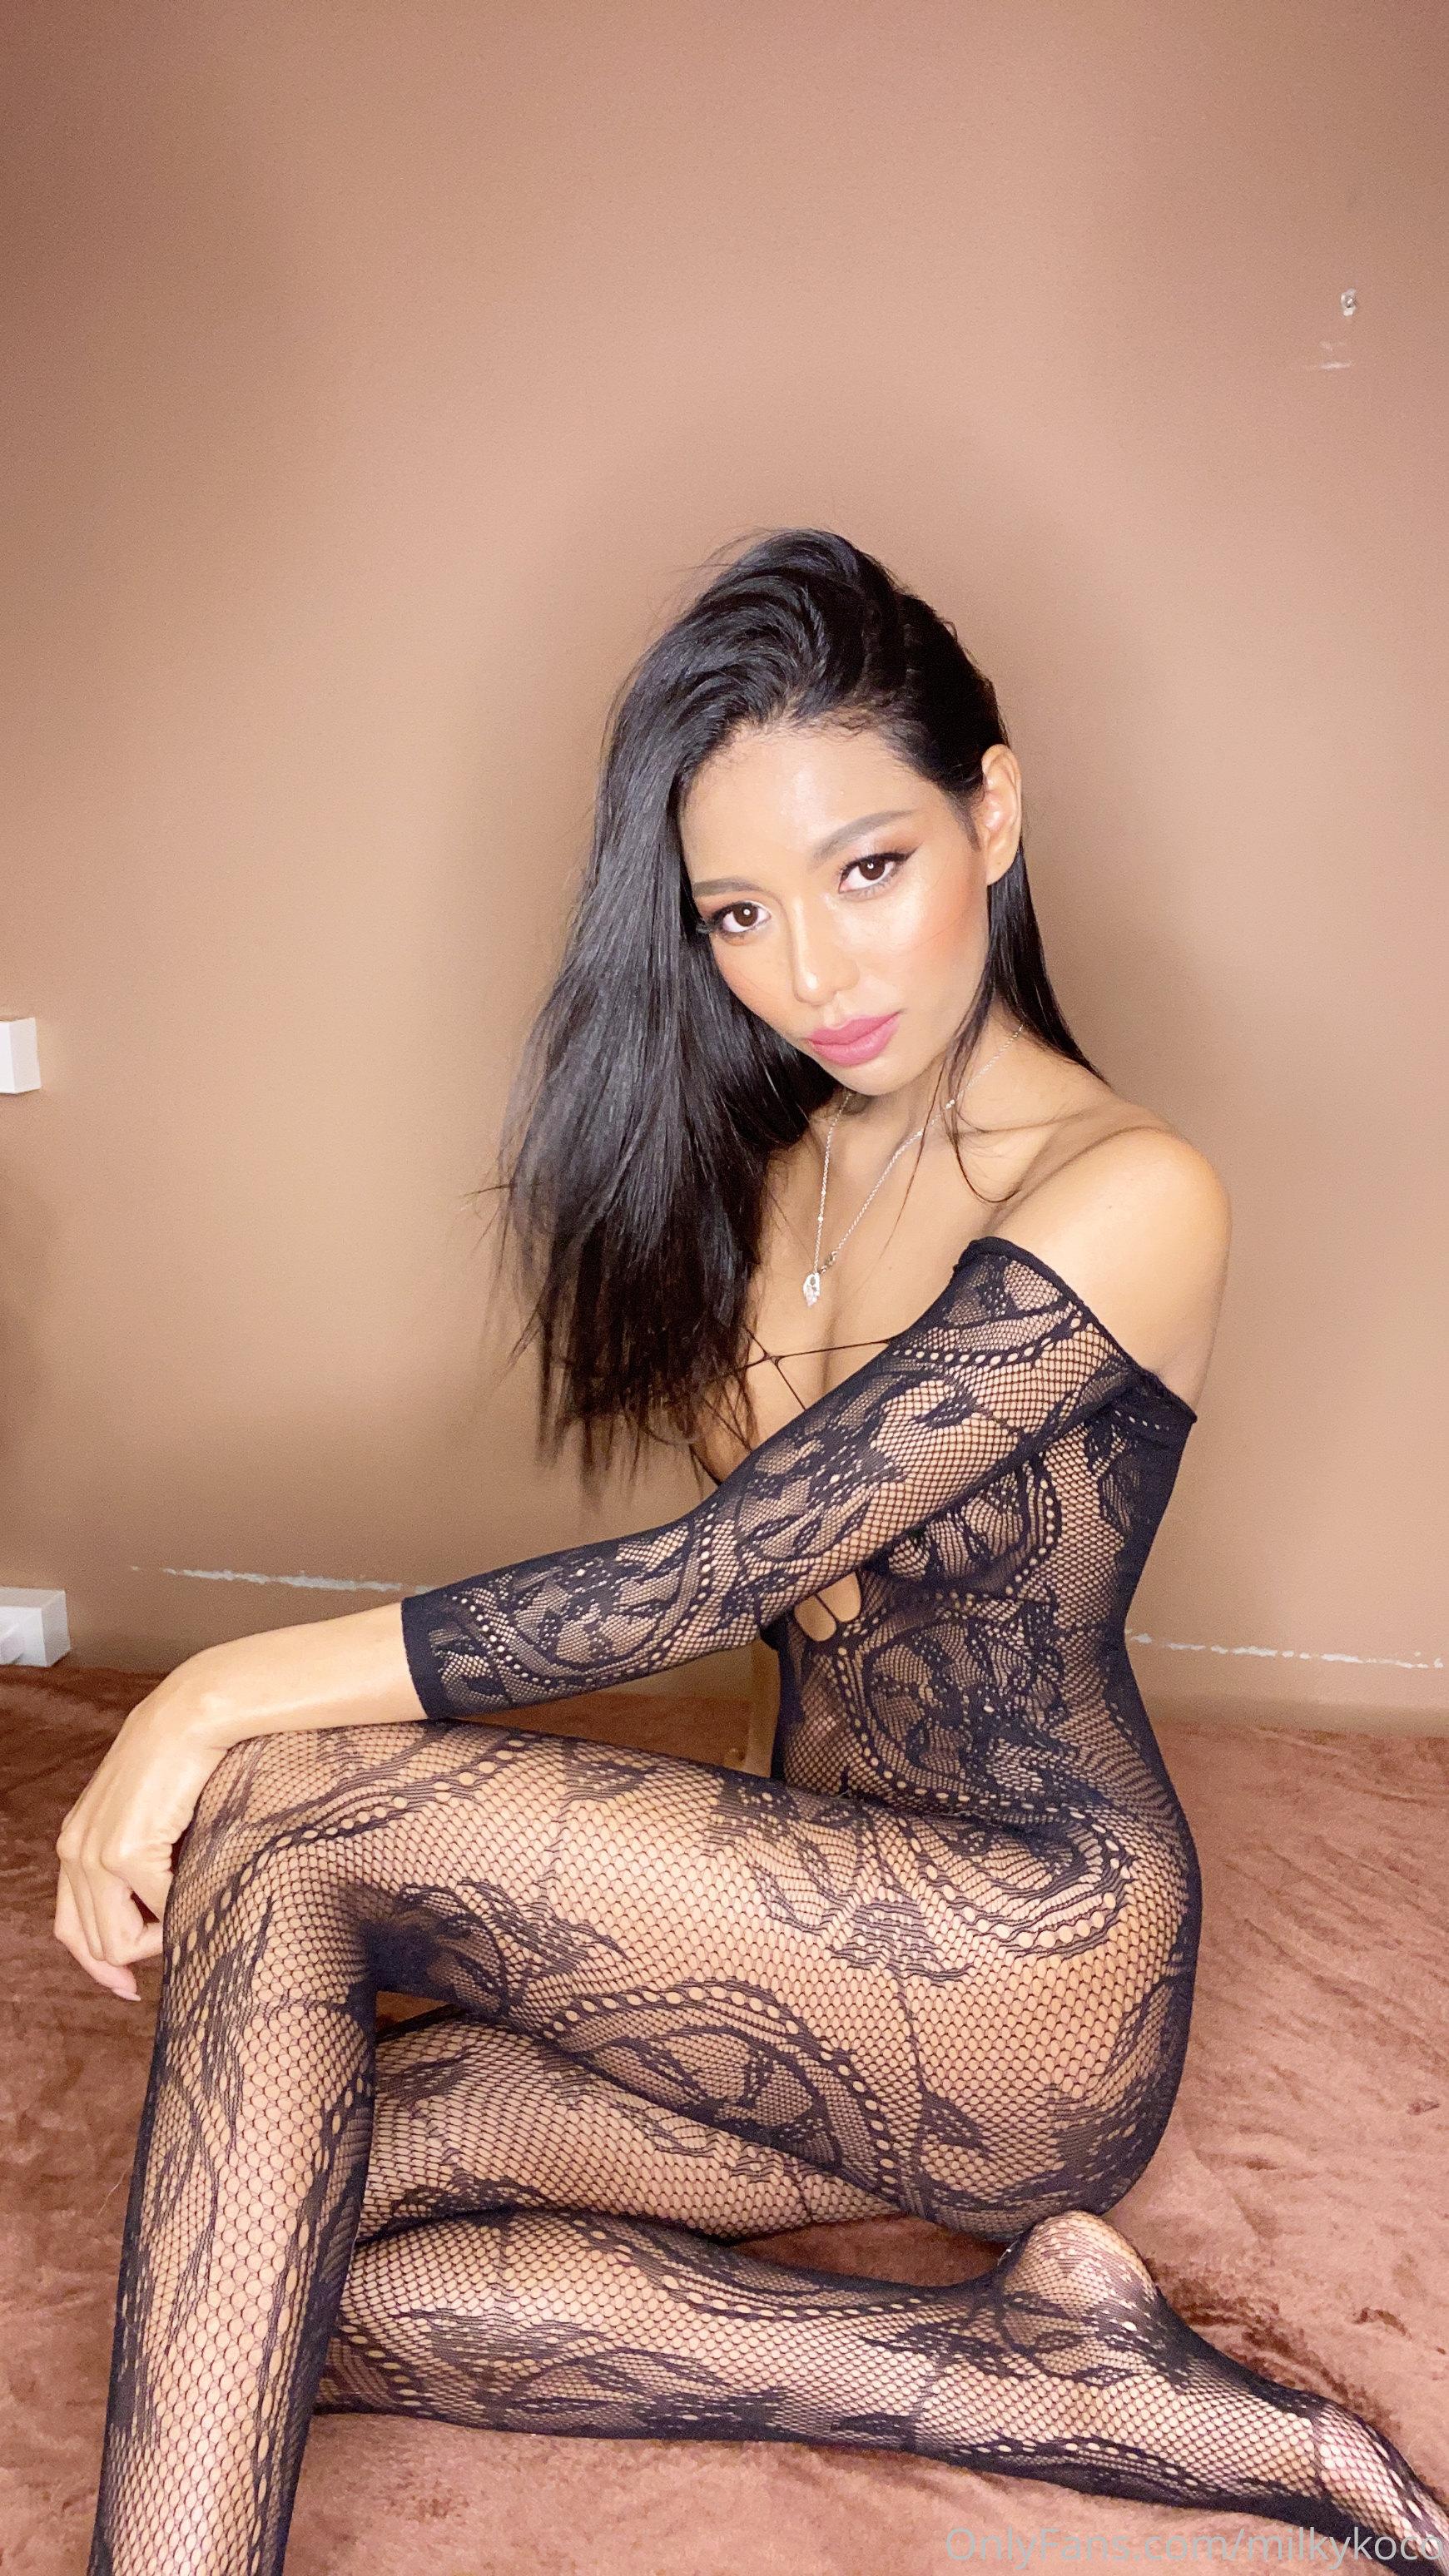 Koko Mylk Bangkok Model Leaked Onlyfans 0109